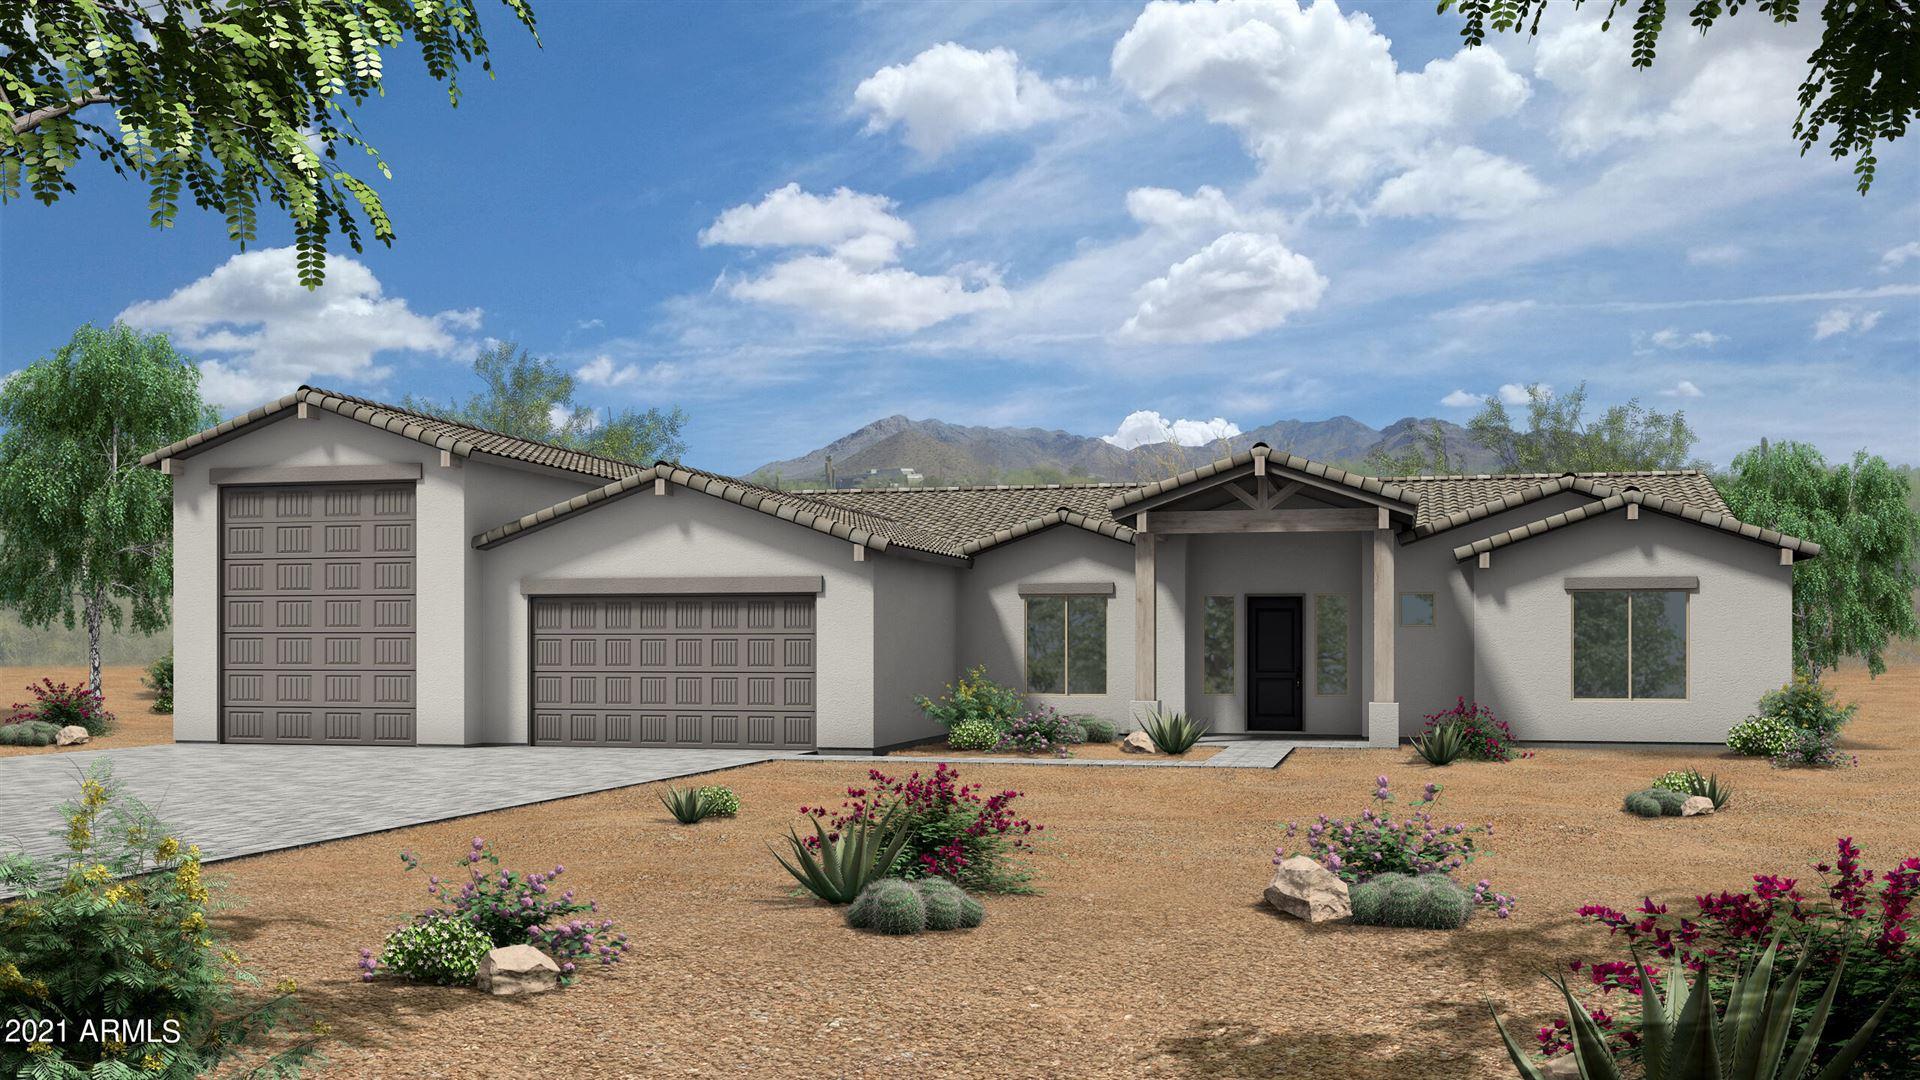 Xx215 N 21 Avenue, Desert Hills, AZ 85086 - MLS#: 6232611